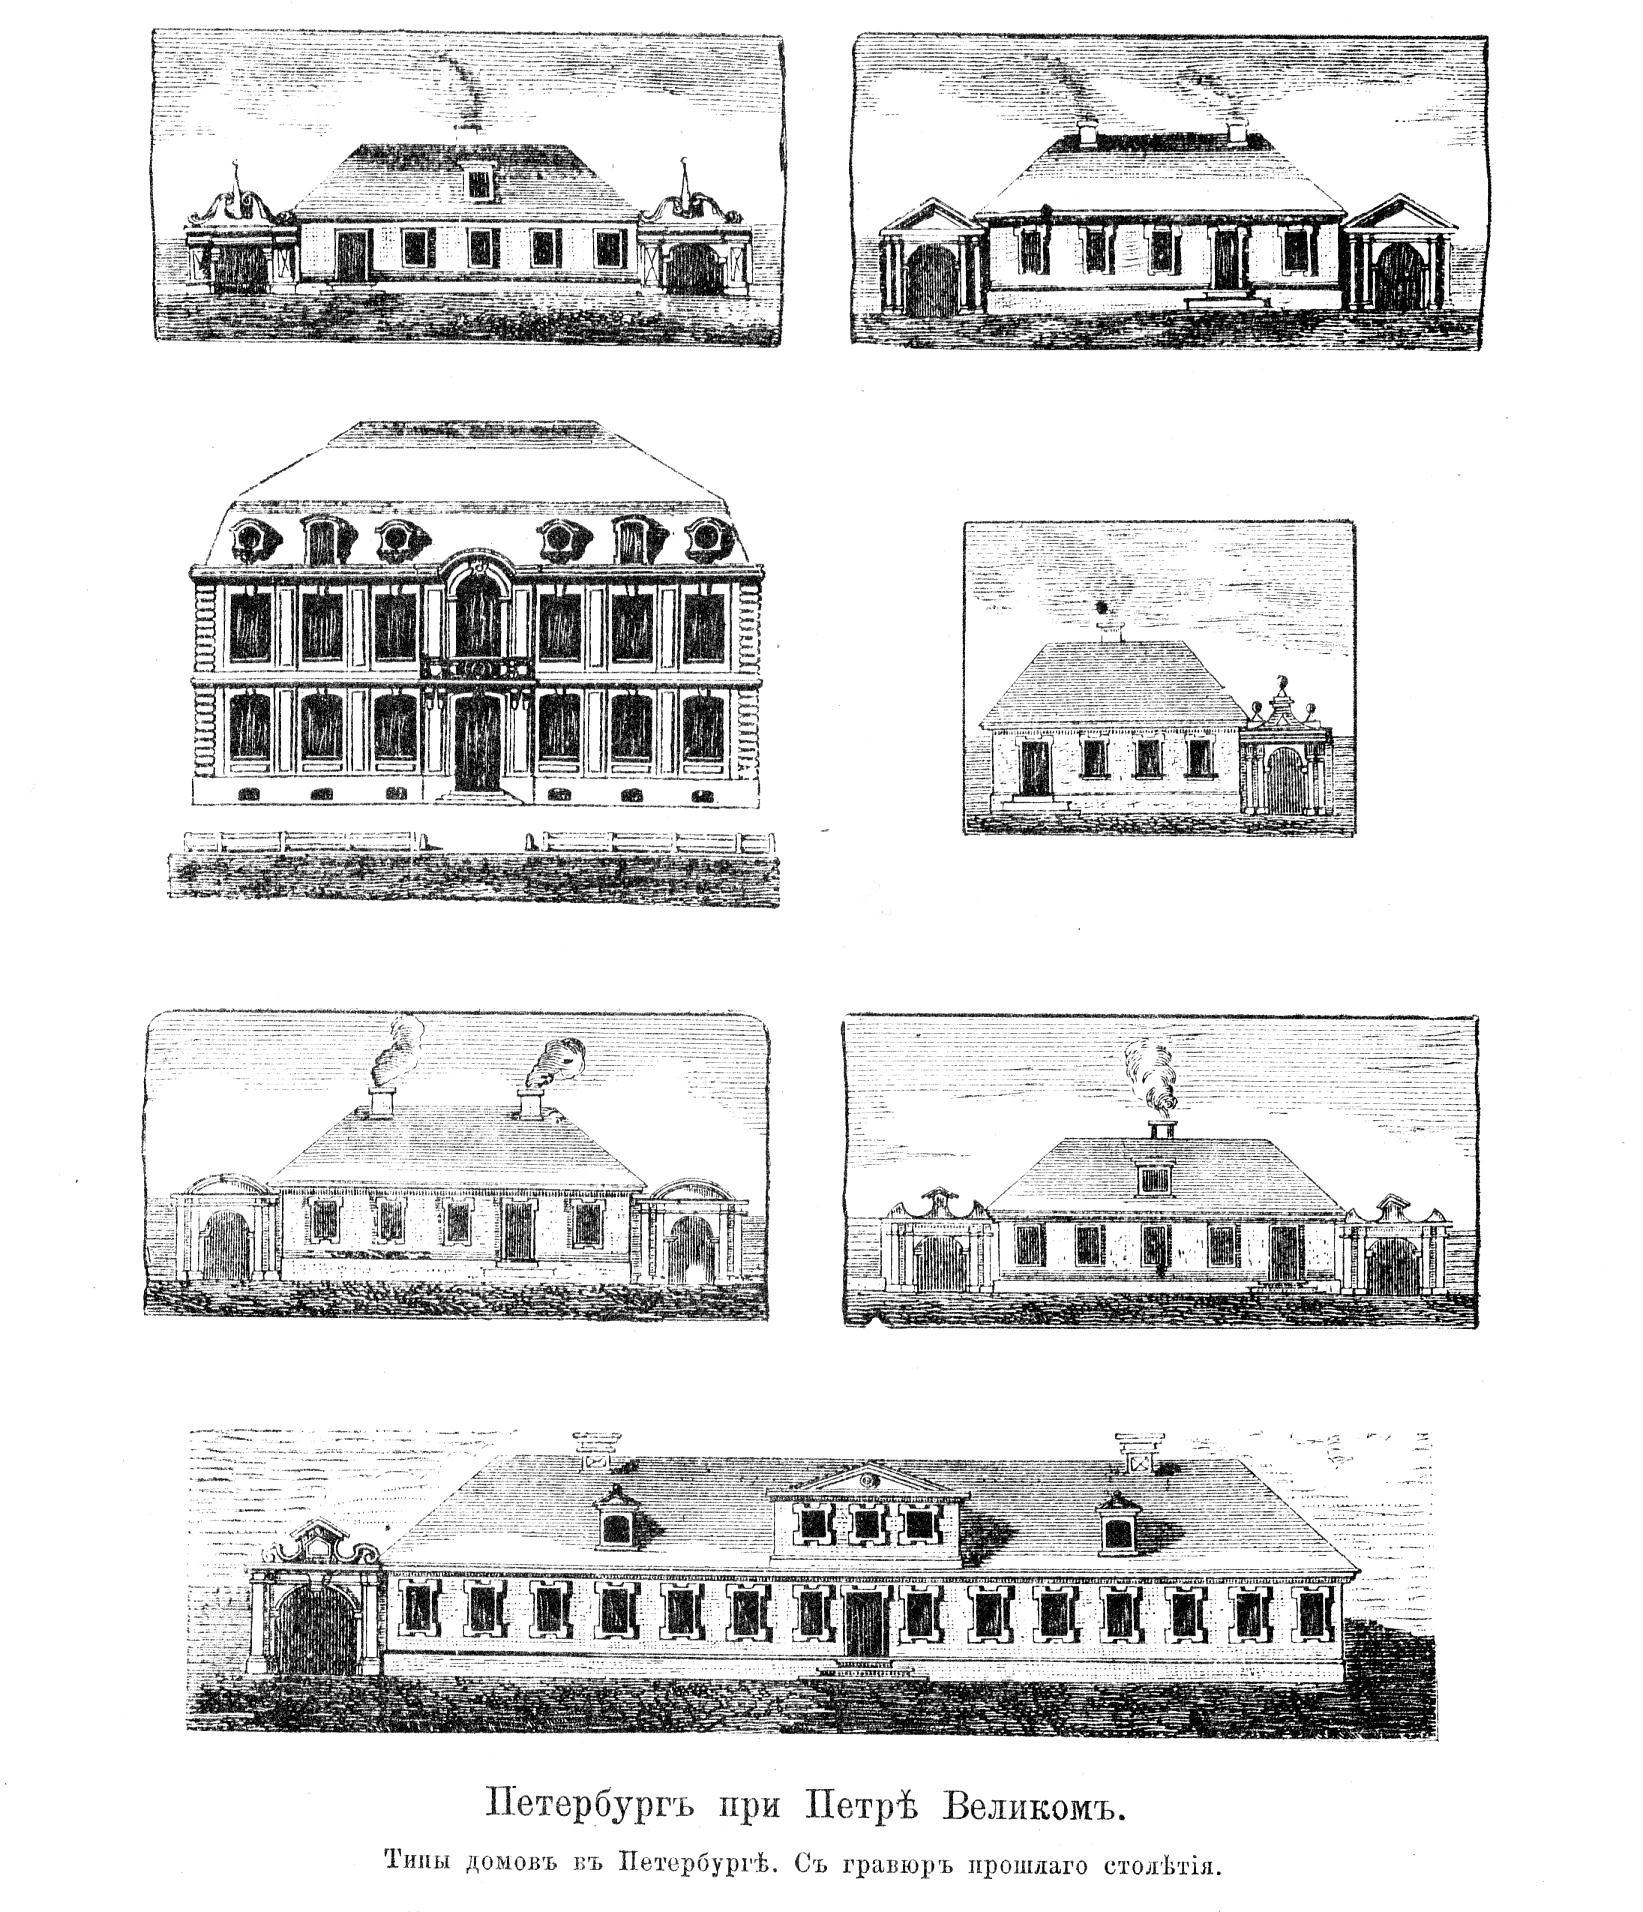 Типы домов - Петербург